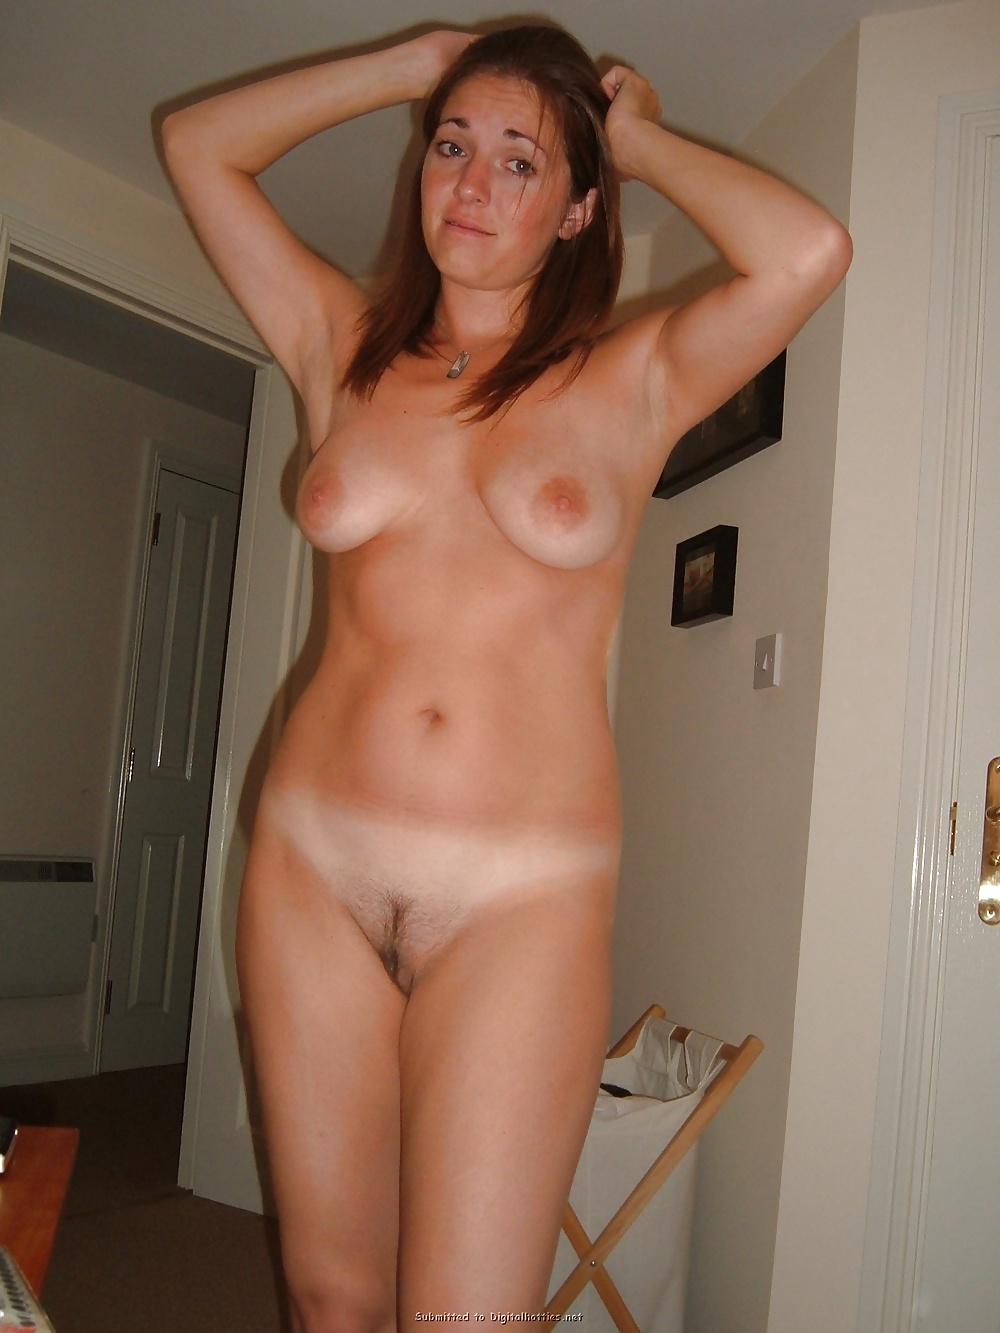 Boobs Nude Stripper Frauen Pictures